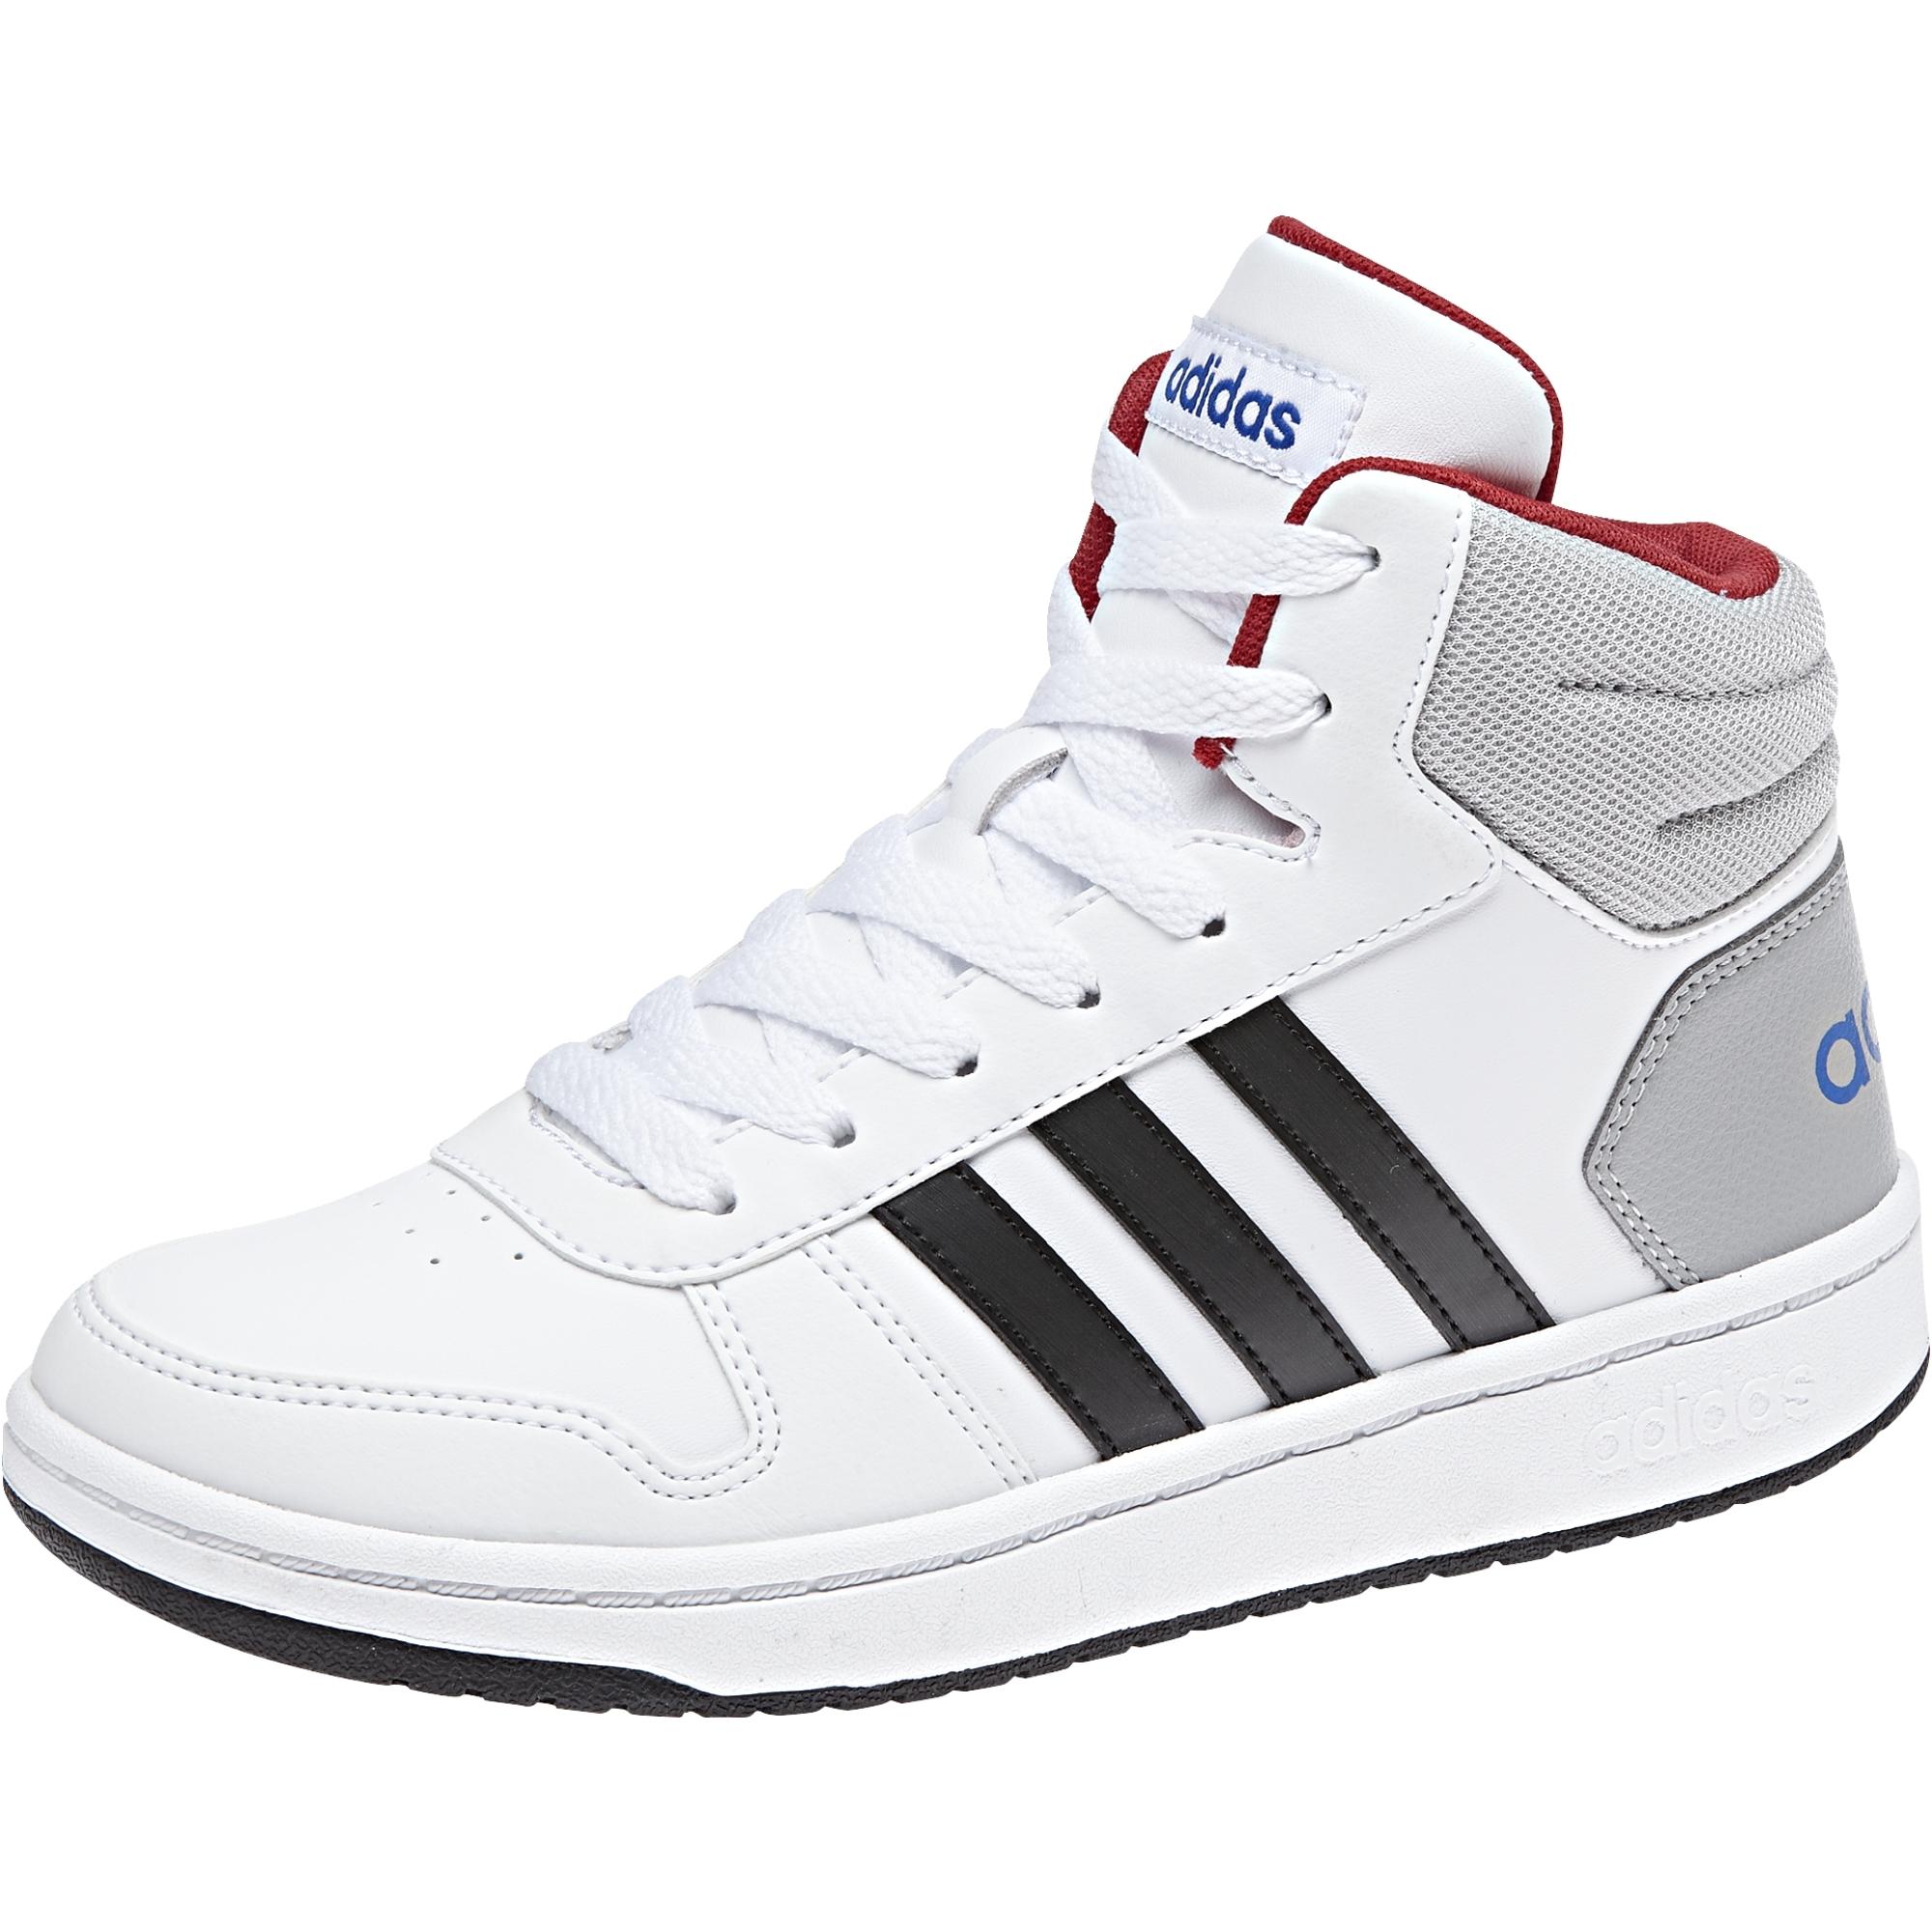 Adidas Hoops Mid 2.0 Kids manelsanchez.pt